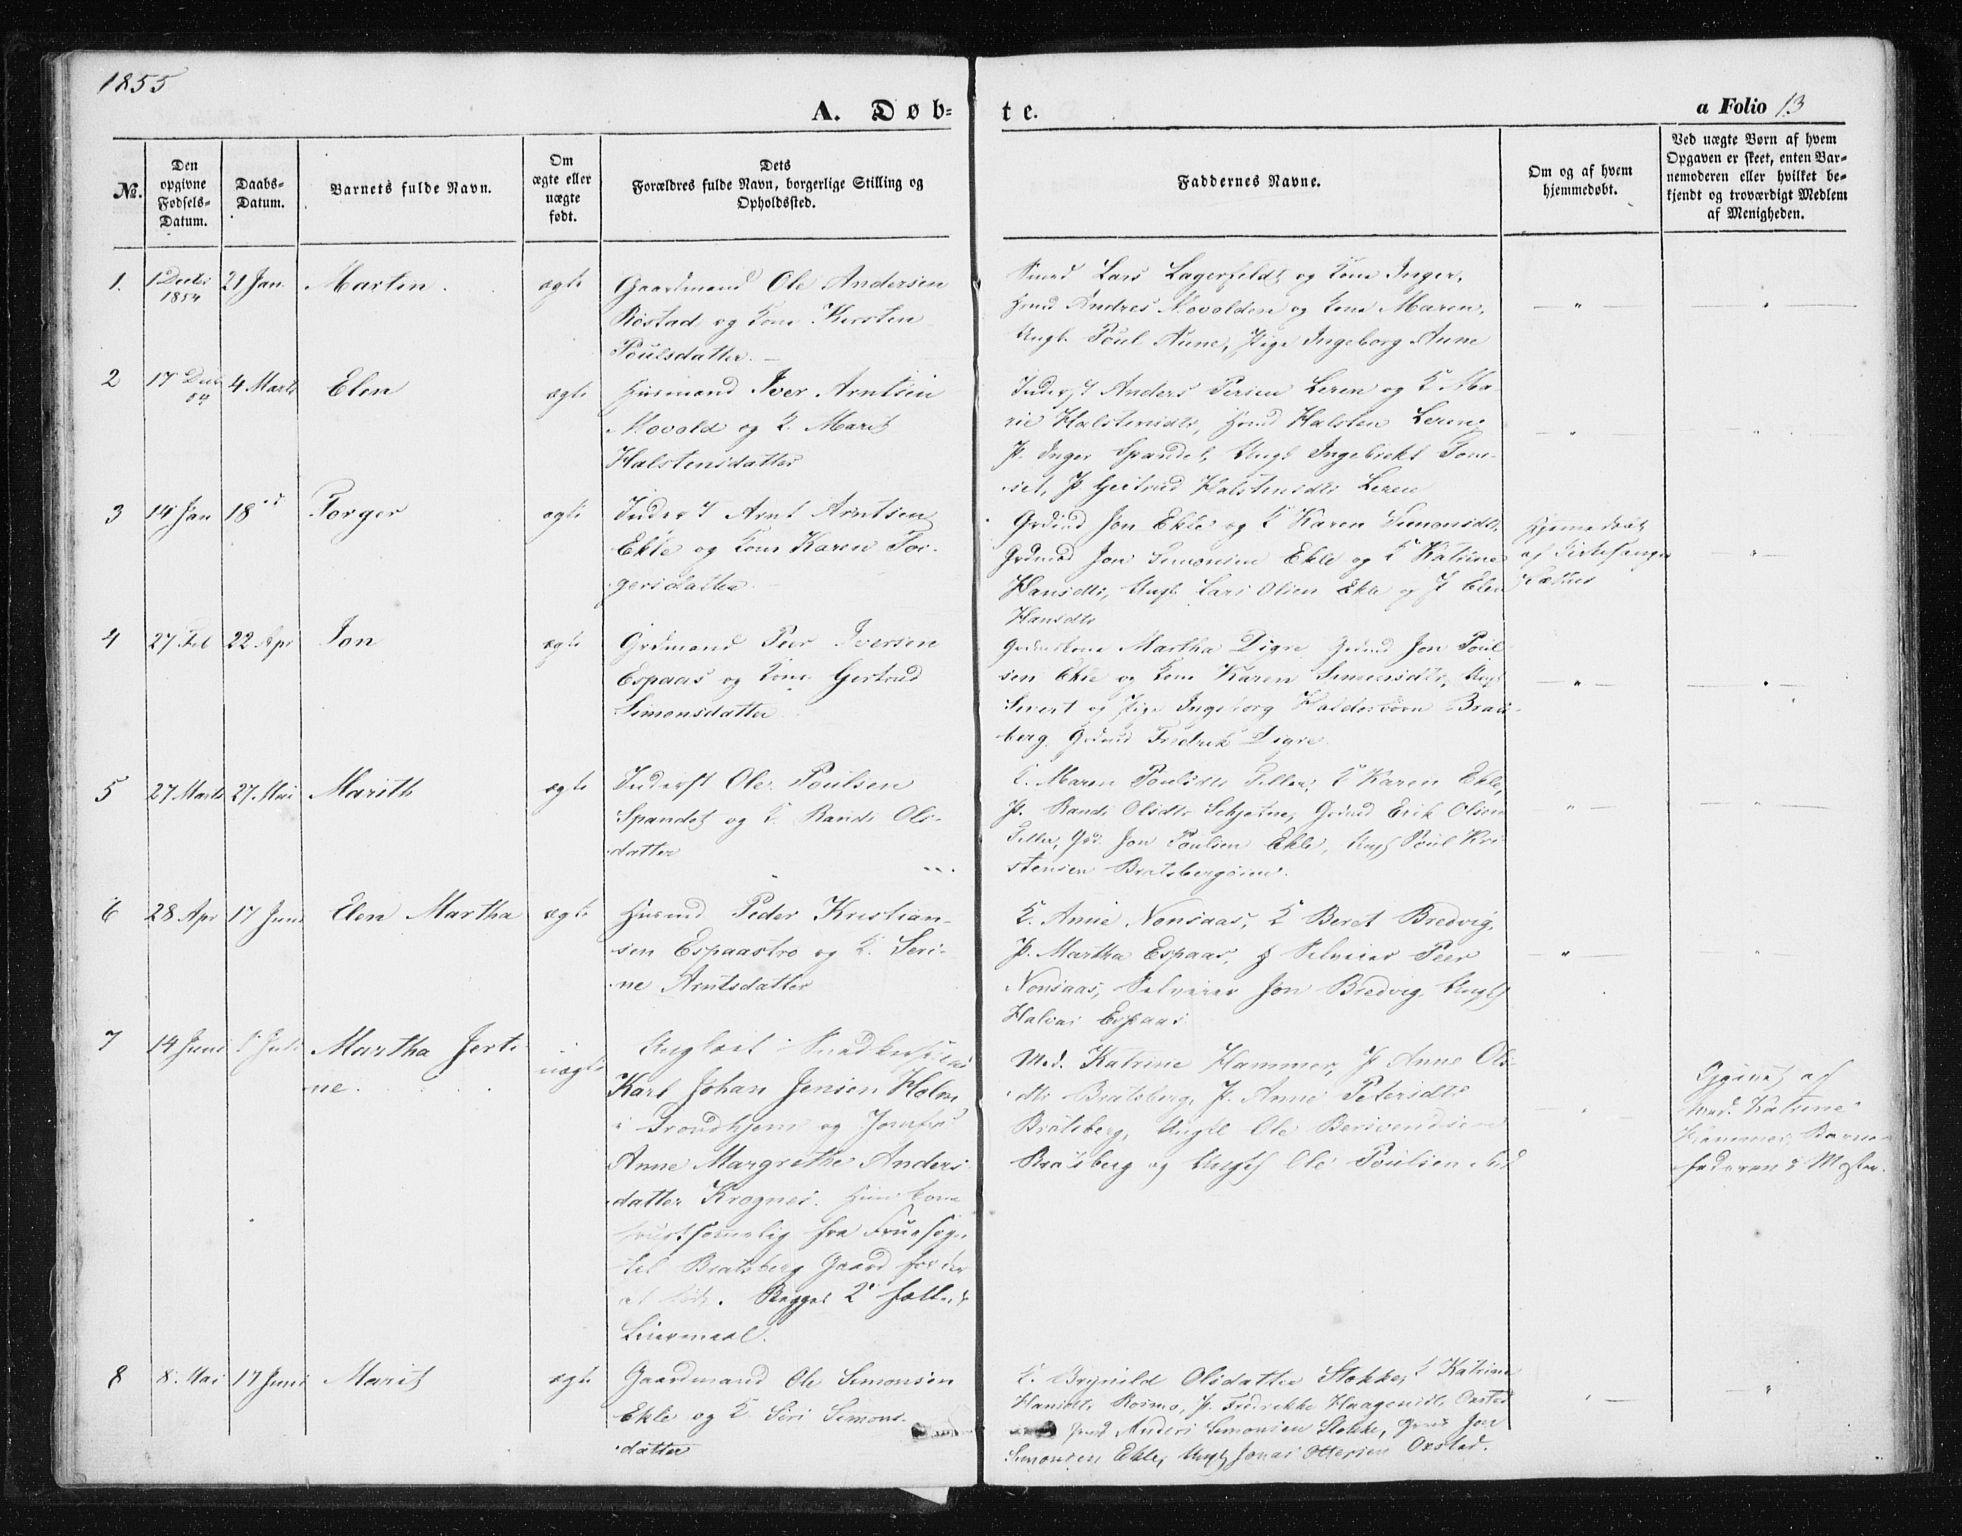 SAT, Ministerialprotokoller, klokkerbøker og fødselsregistre - Sør-Trøndelag, 608/L0332: Parish register (official) no. 608A01, 1848-1861, p. 13